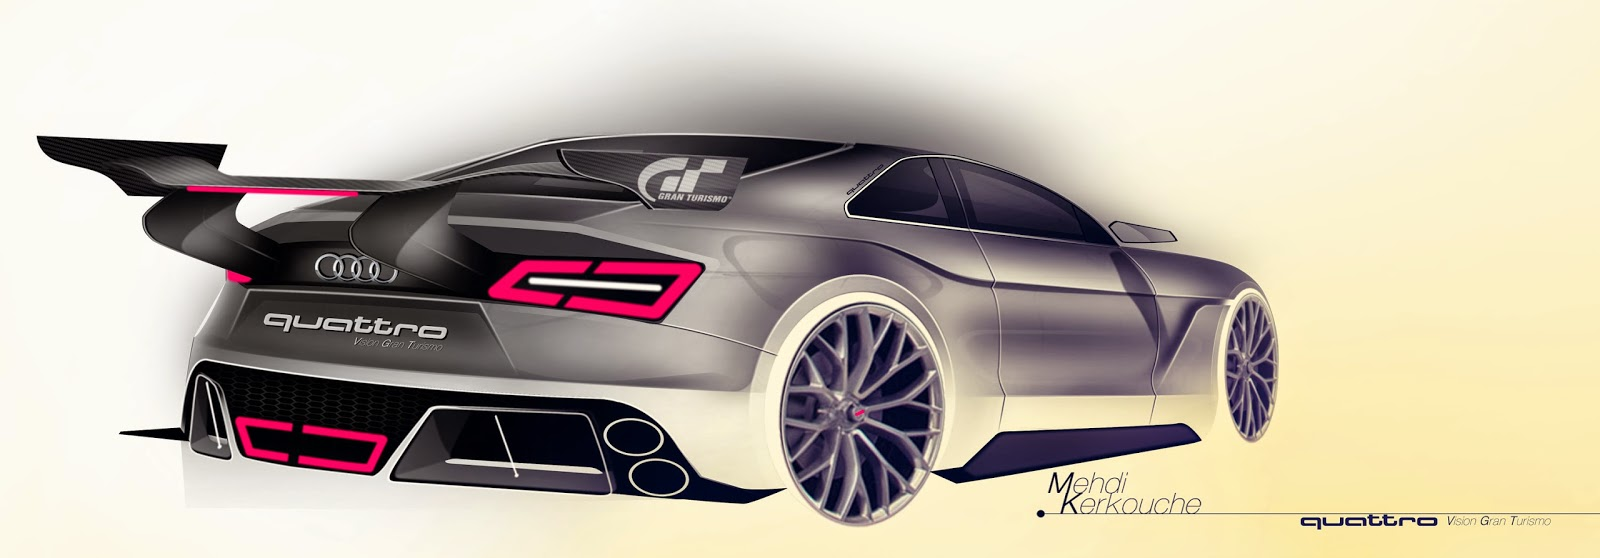 Audi Vision Gran Turismo Mehdi Kerkouche